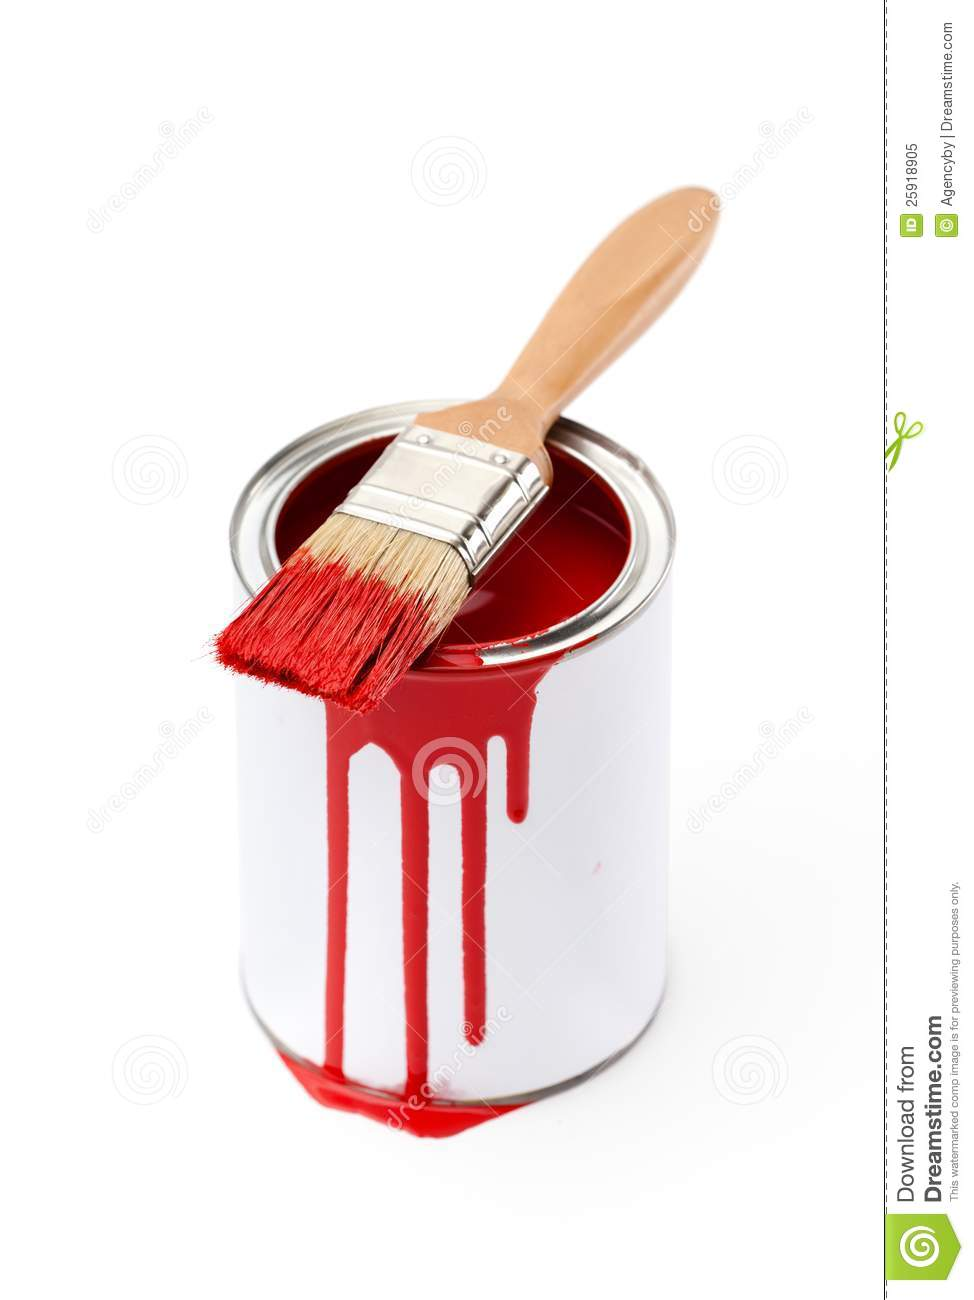 Paint clipart paint tin Clipart Panda Full paint and